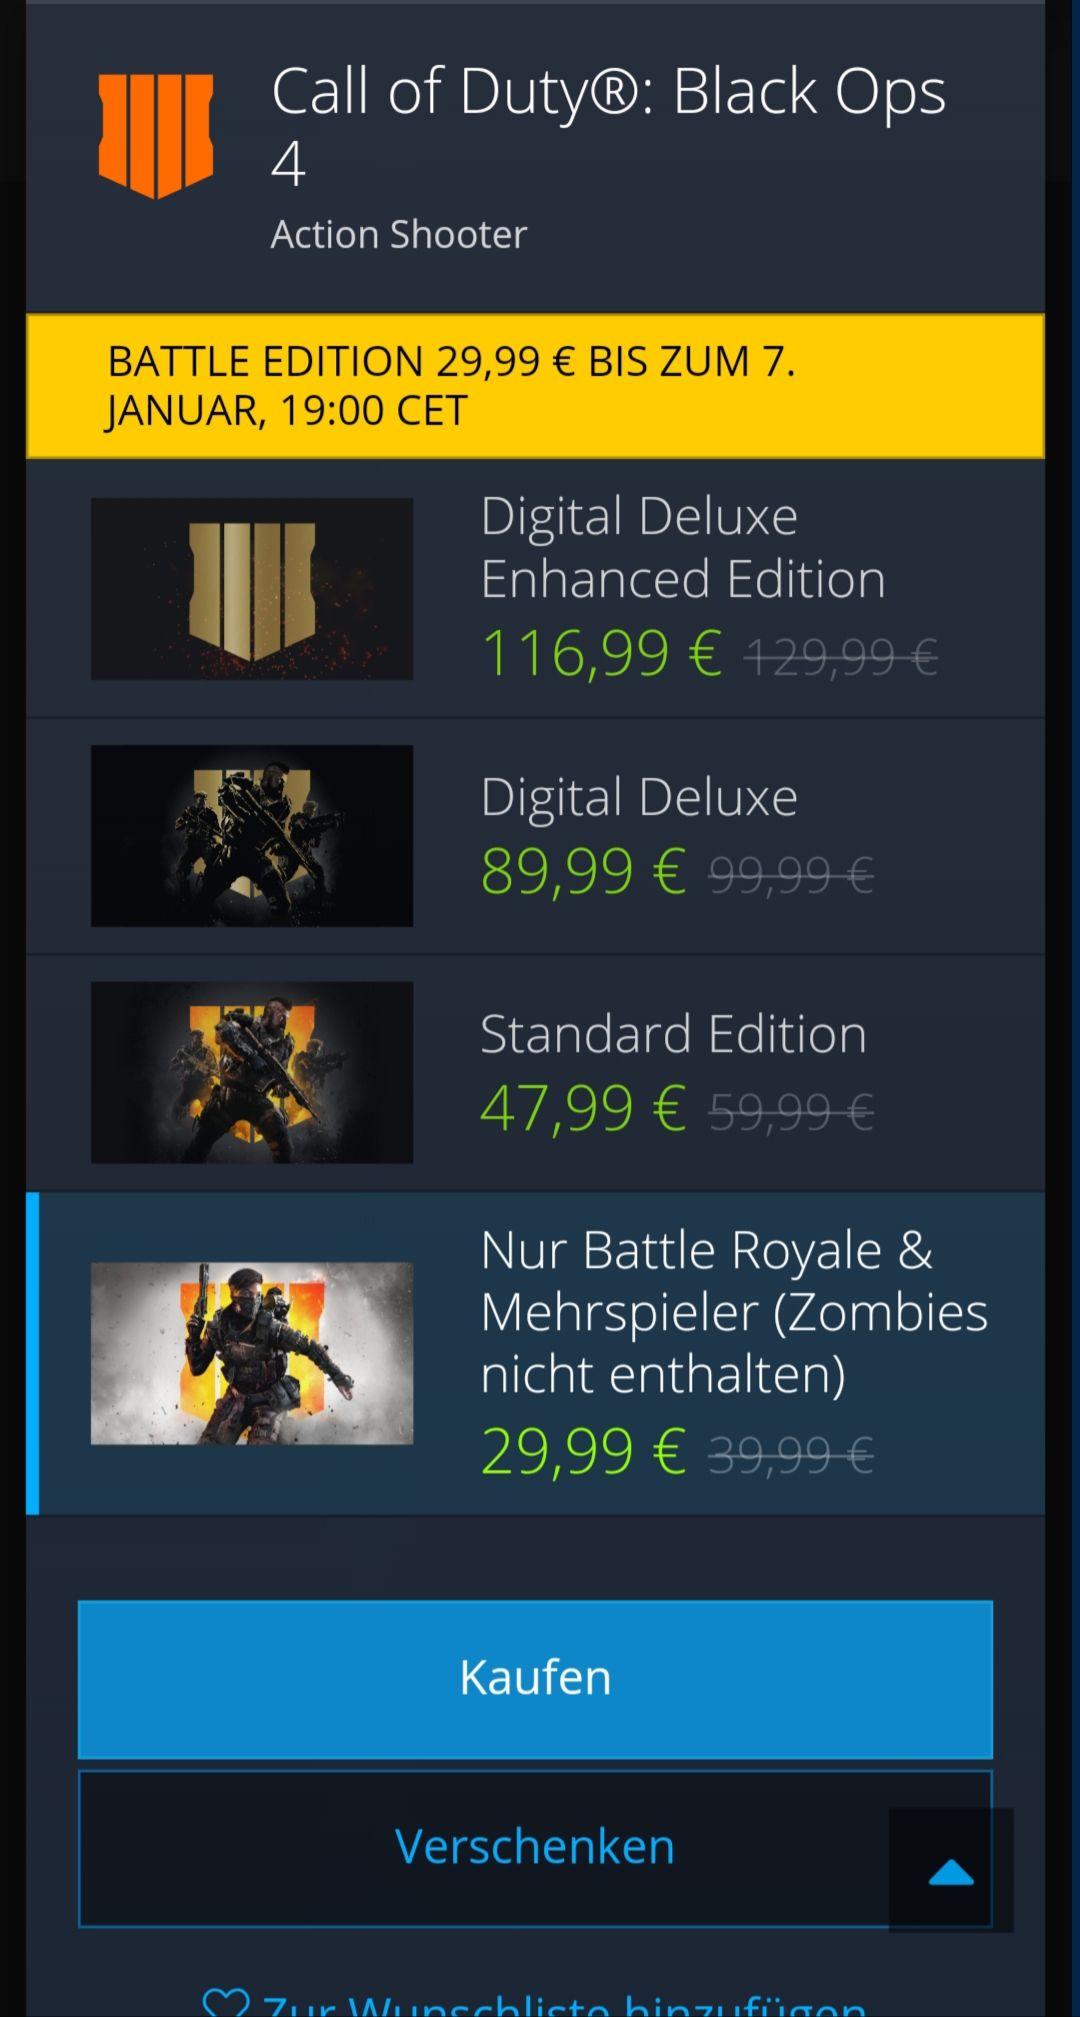 Black Ops 4 nur Multiplayer&Battle Royal (Zombie Modus nicht)